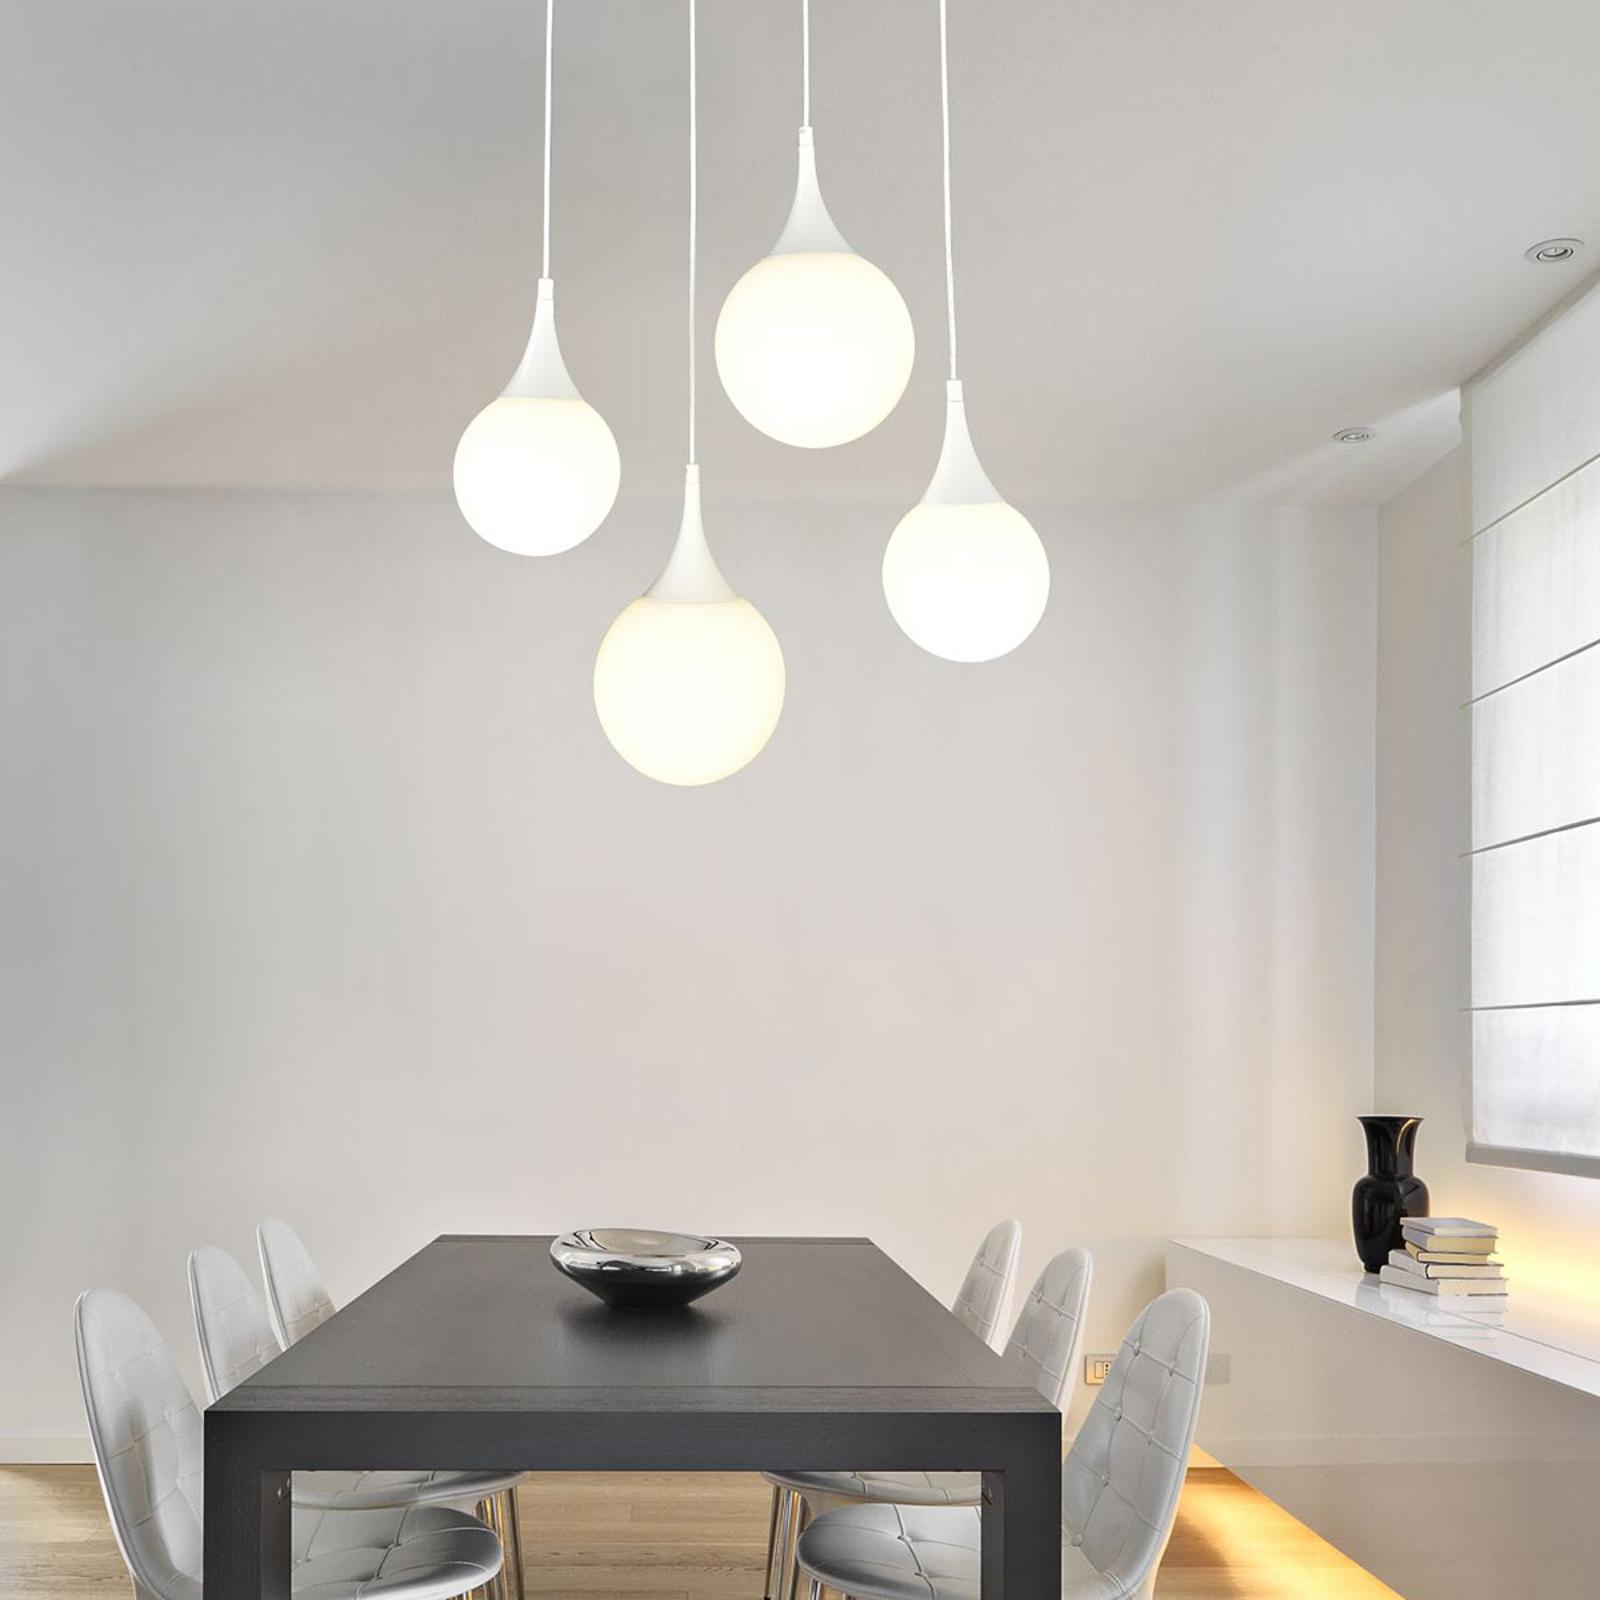 Dewdrop - mooie glazen hanglamp